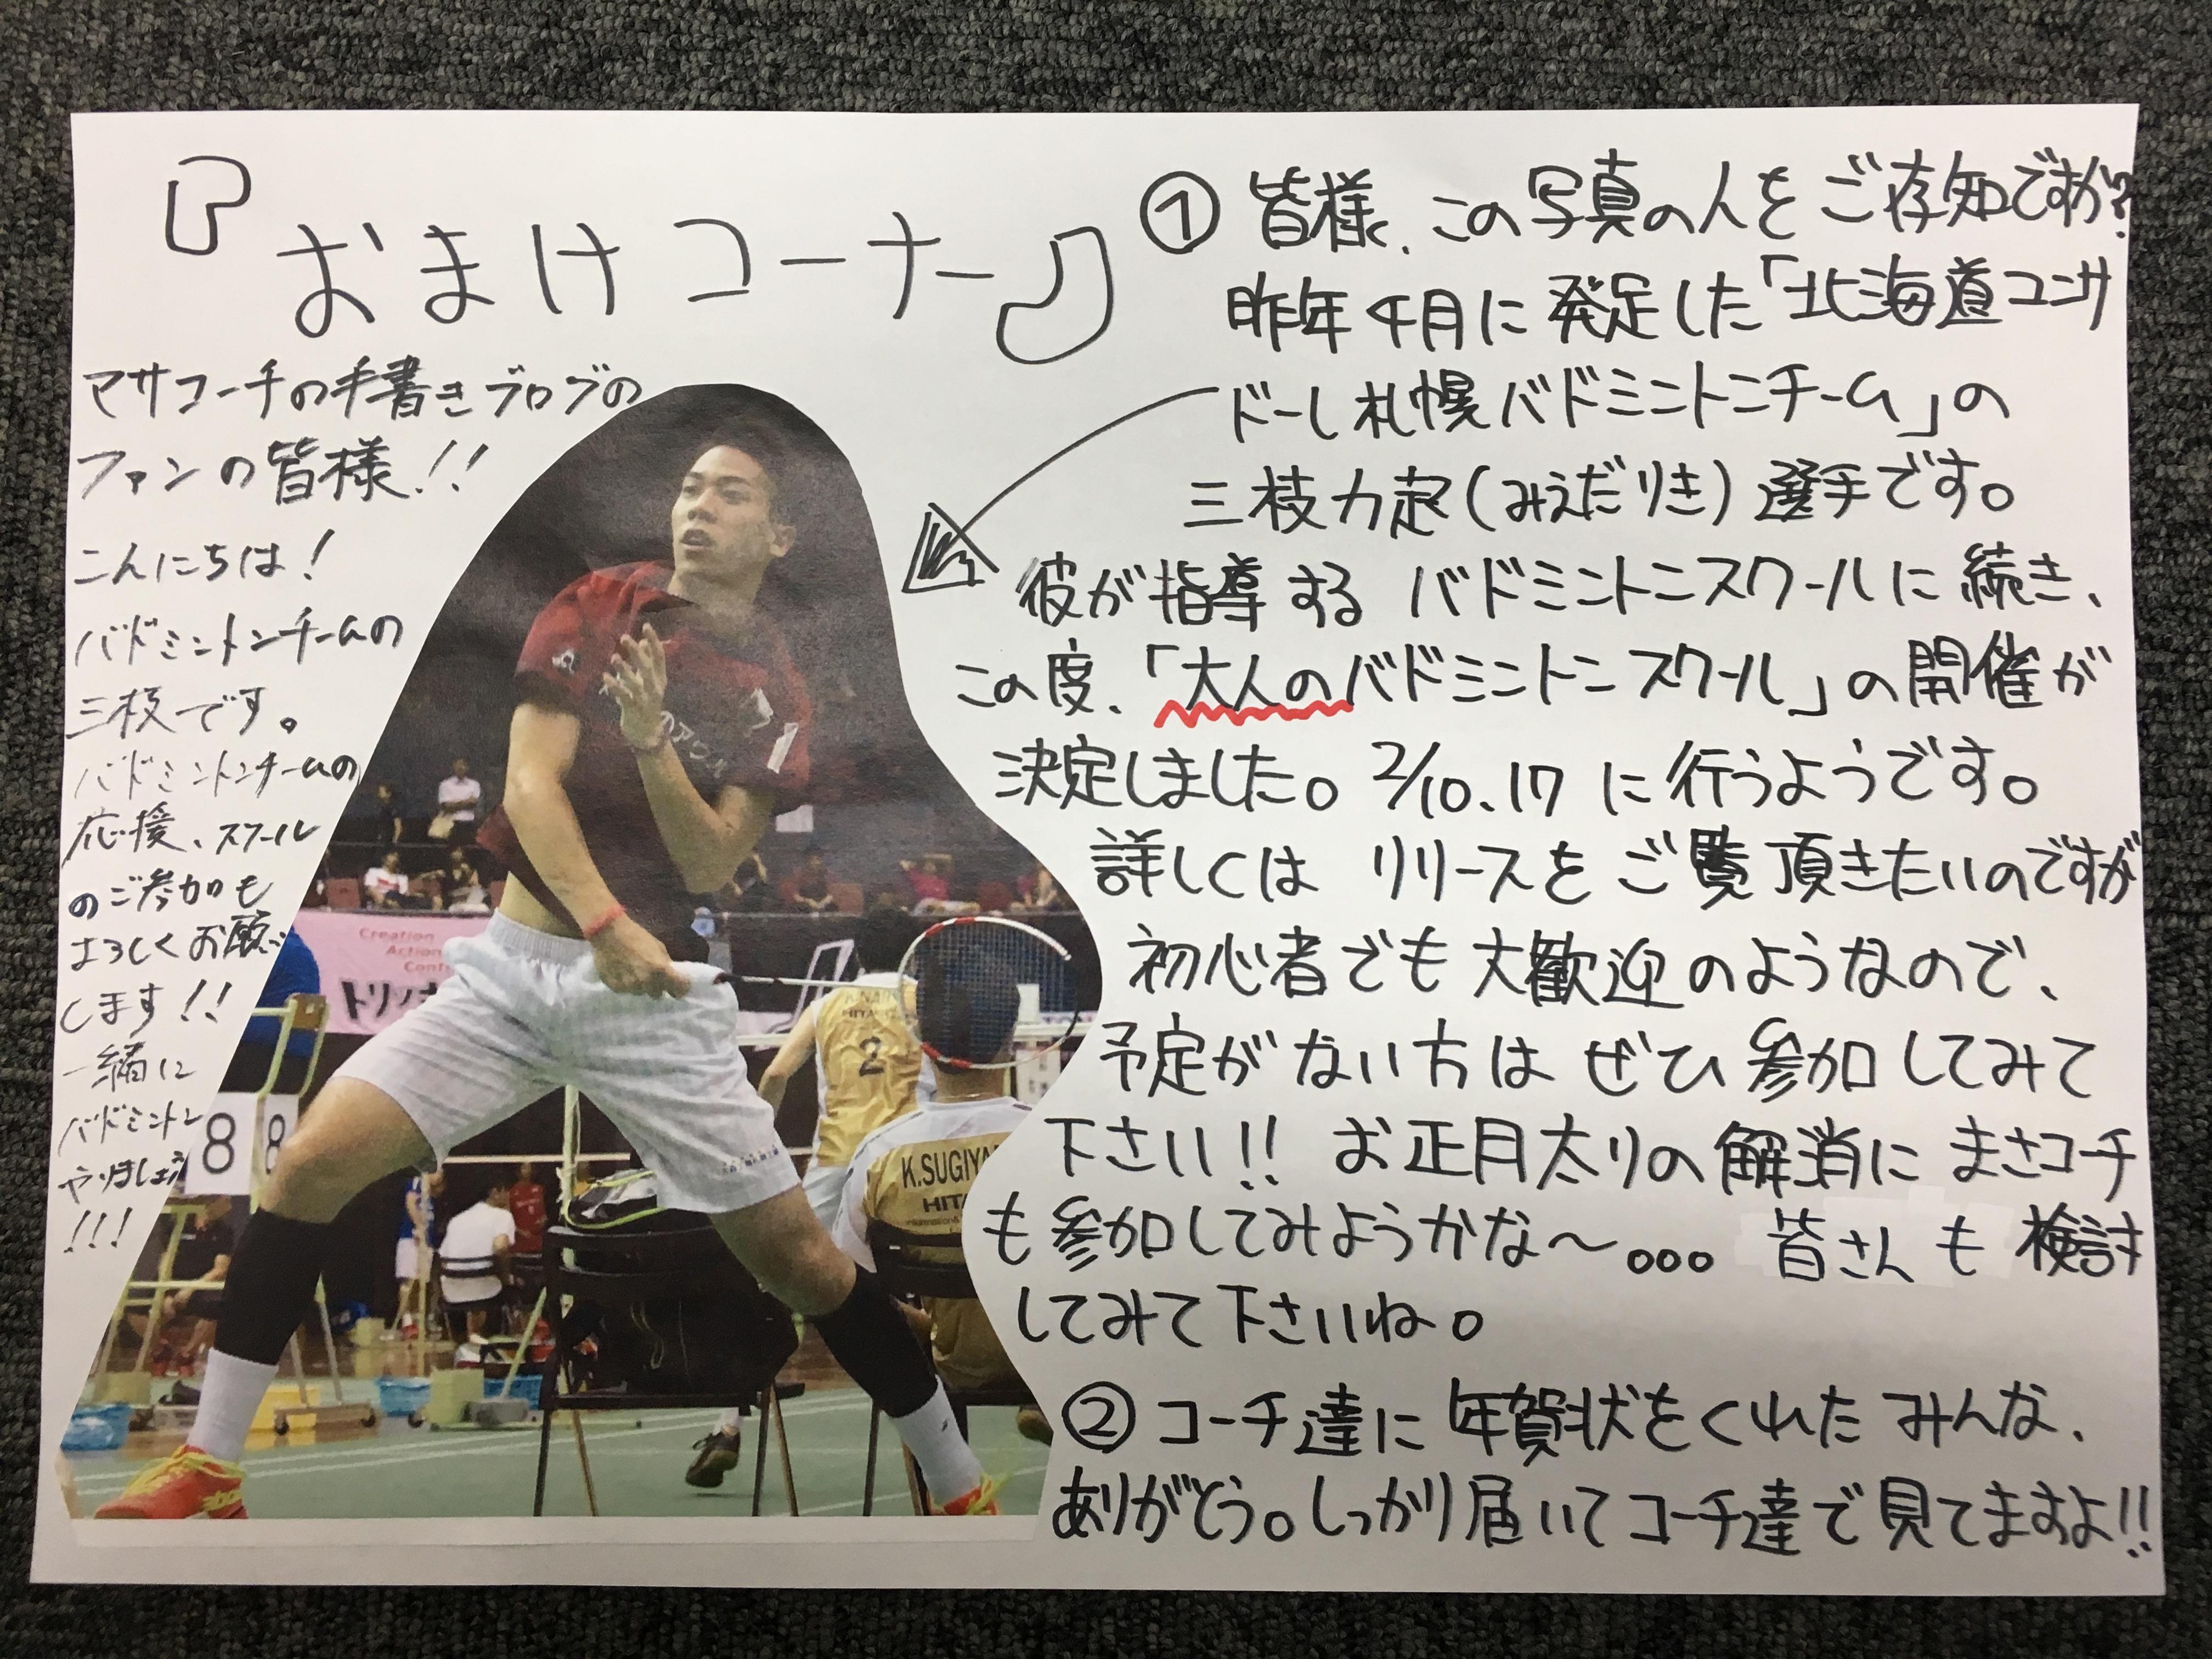 http://chsc.jp/report/up_images/D9351A64-6362-4818-9A31-965613DBCC0A.jpeg